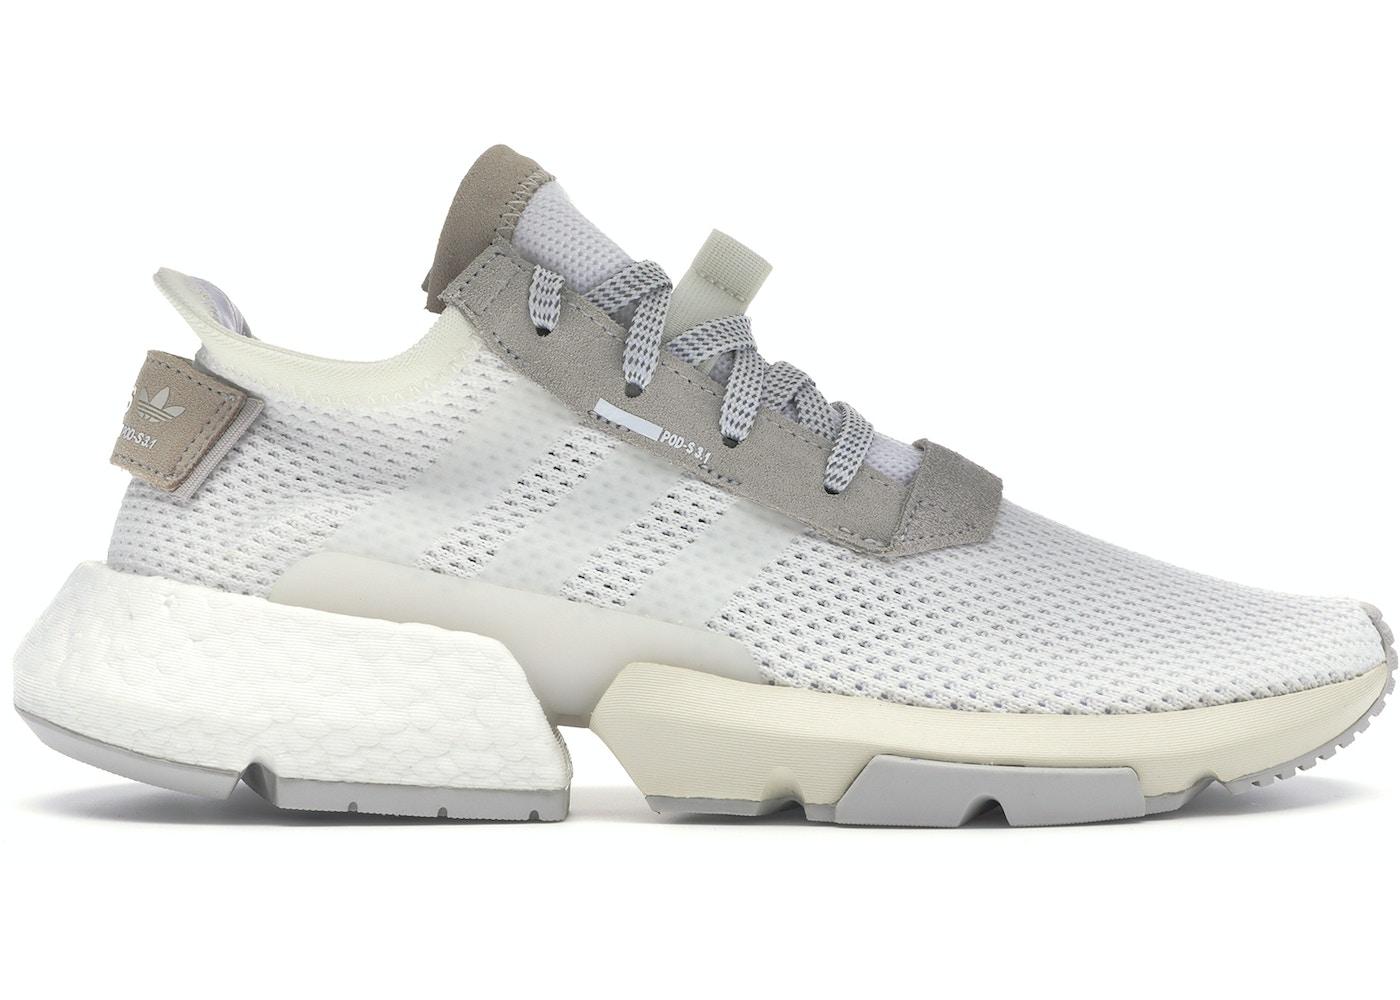 5e864f5926d adidas POD-S3.1 Cloud White - B28089